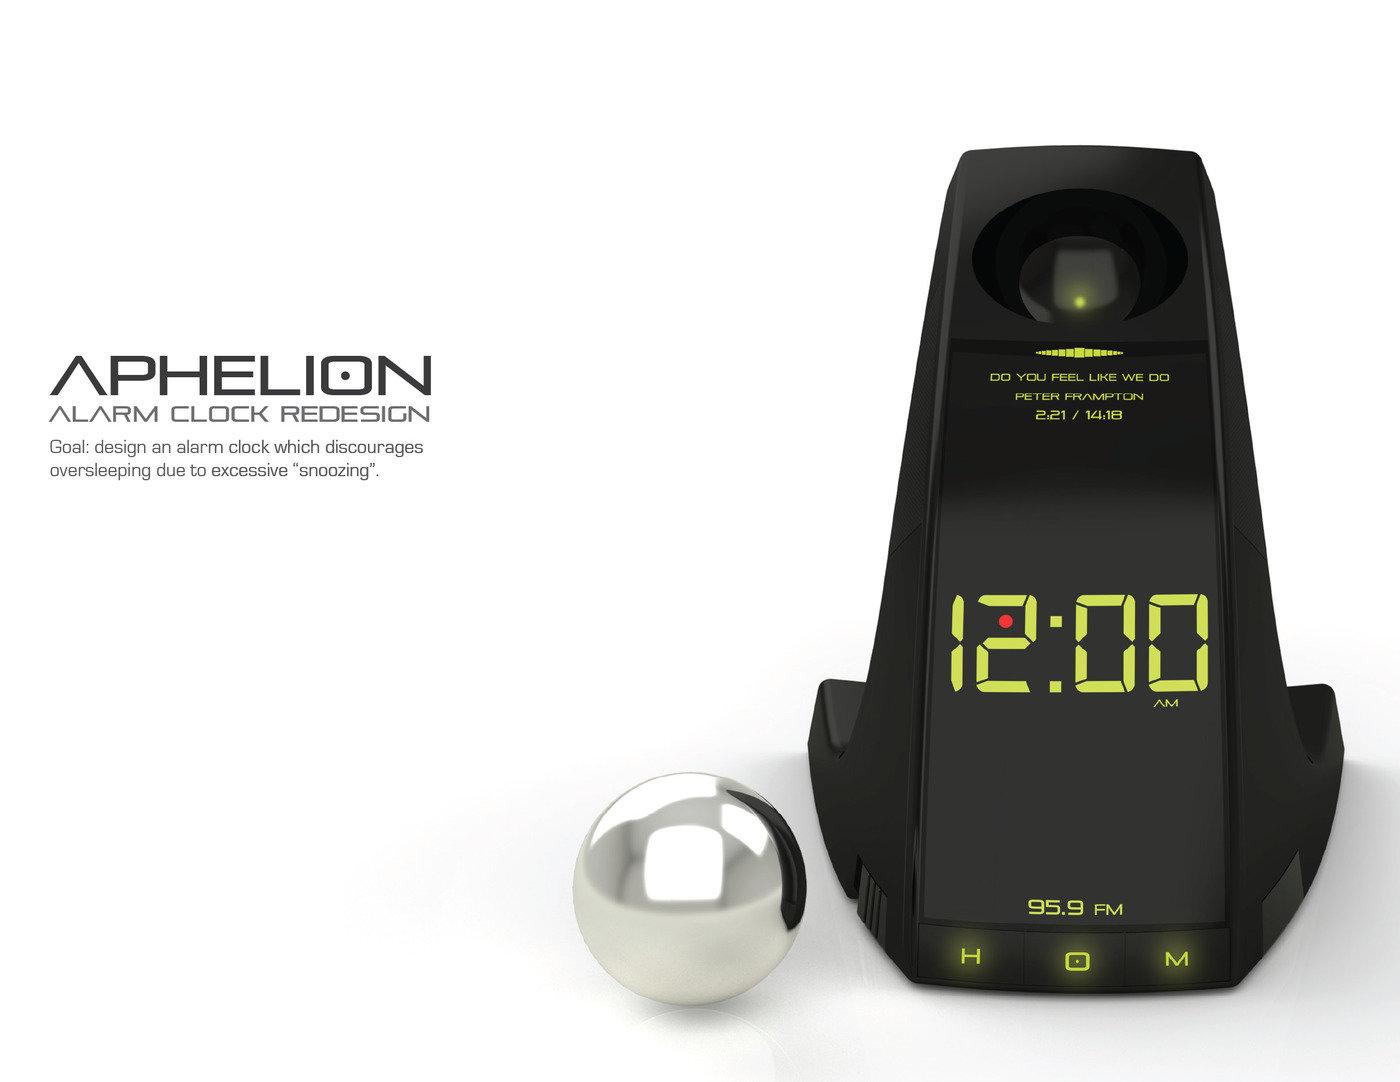 Aphelion - Alarm Clock Redesign by Corey Harris at Coroflot com